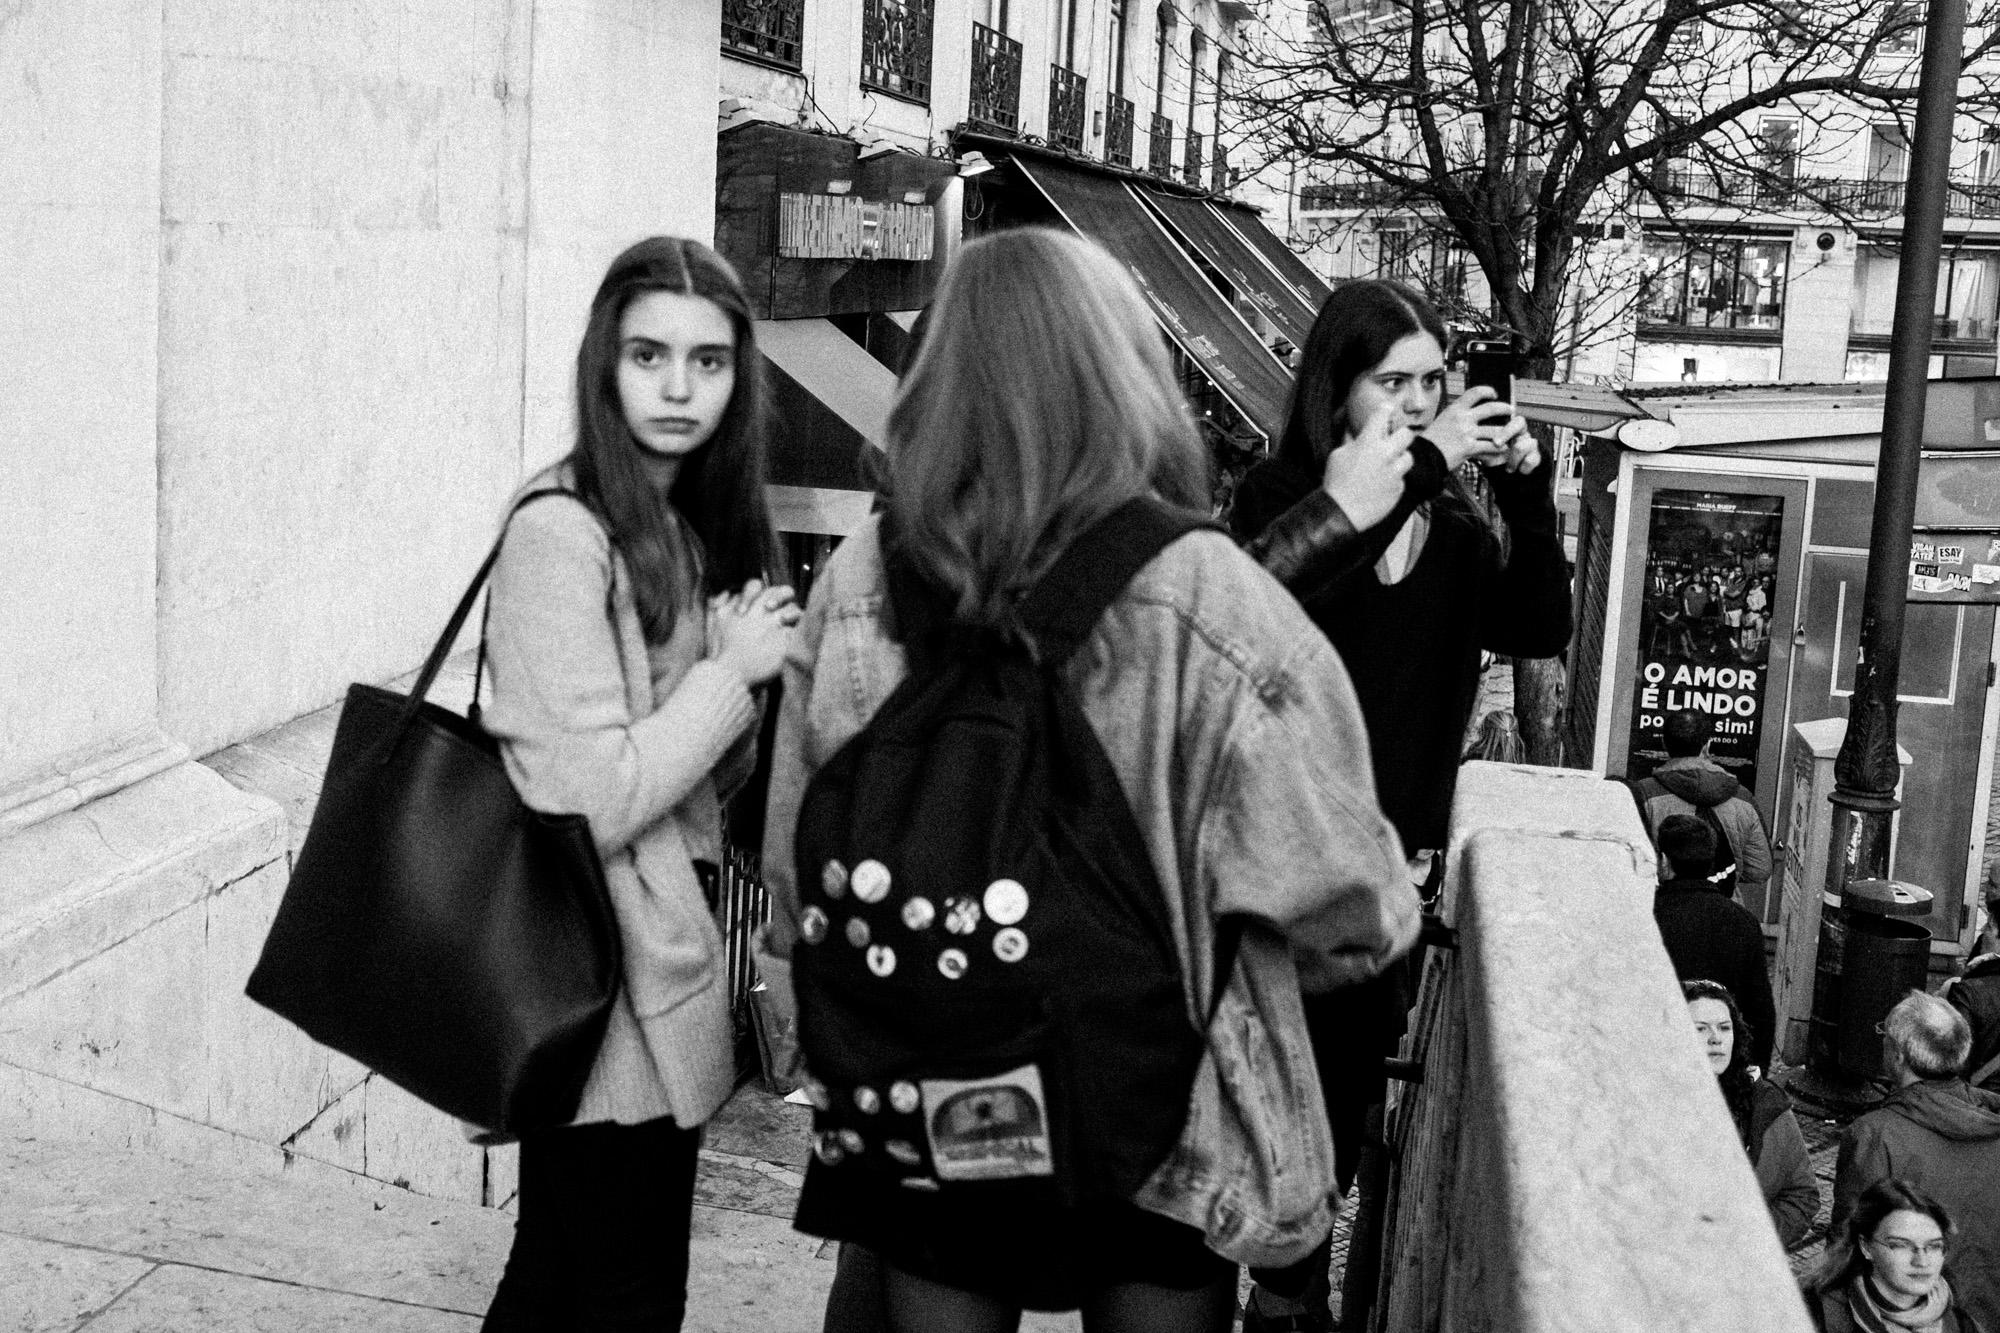 streets-of-lisbon-25.jpg